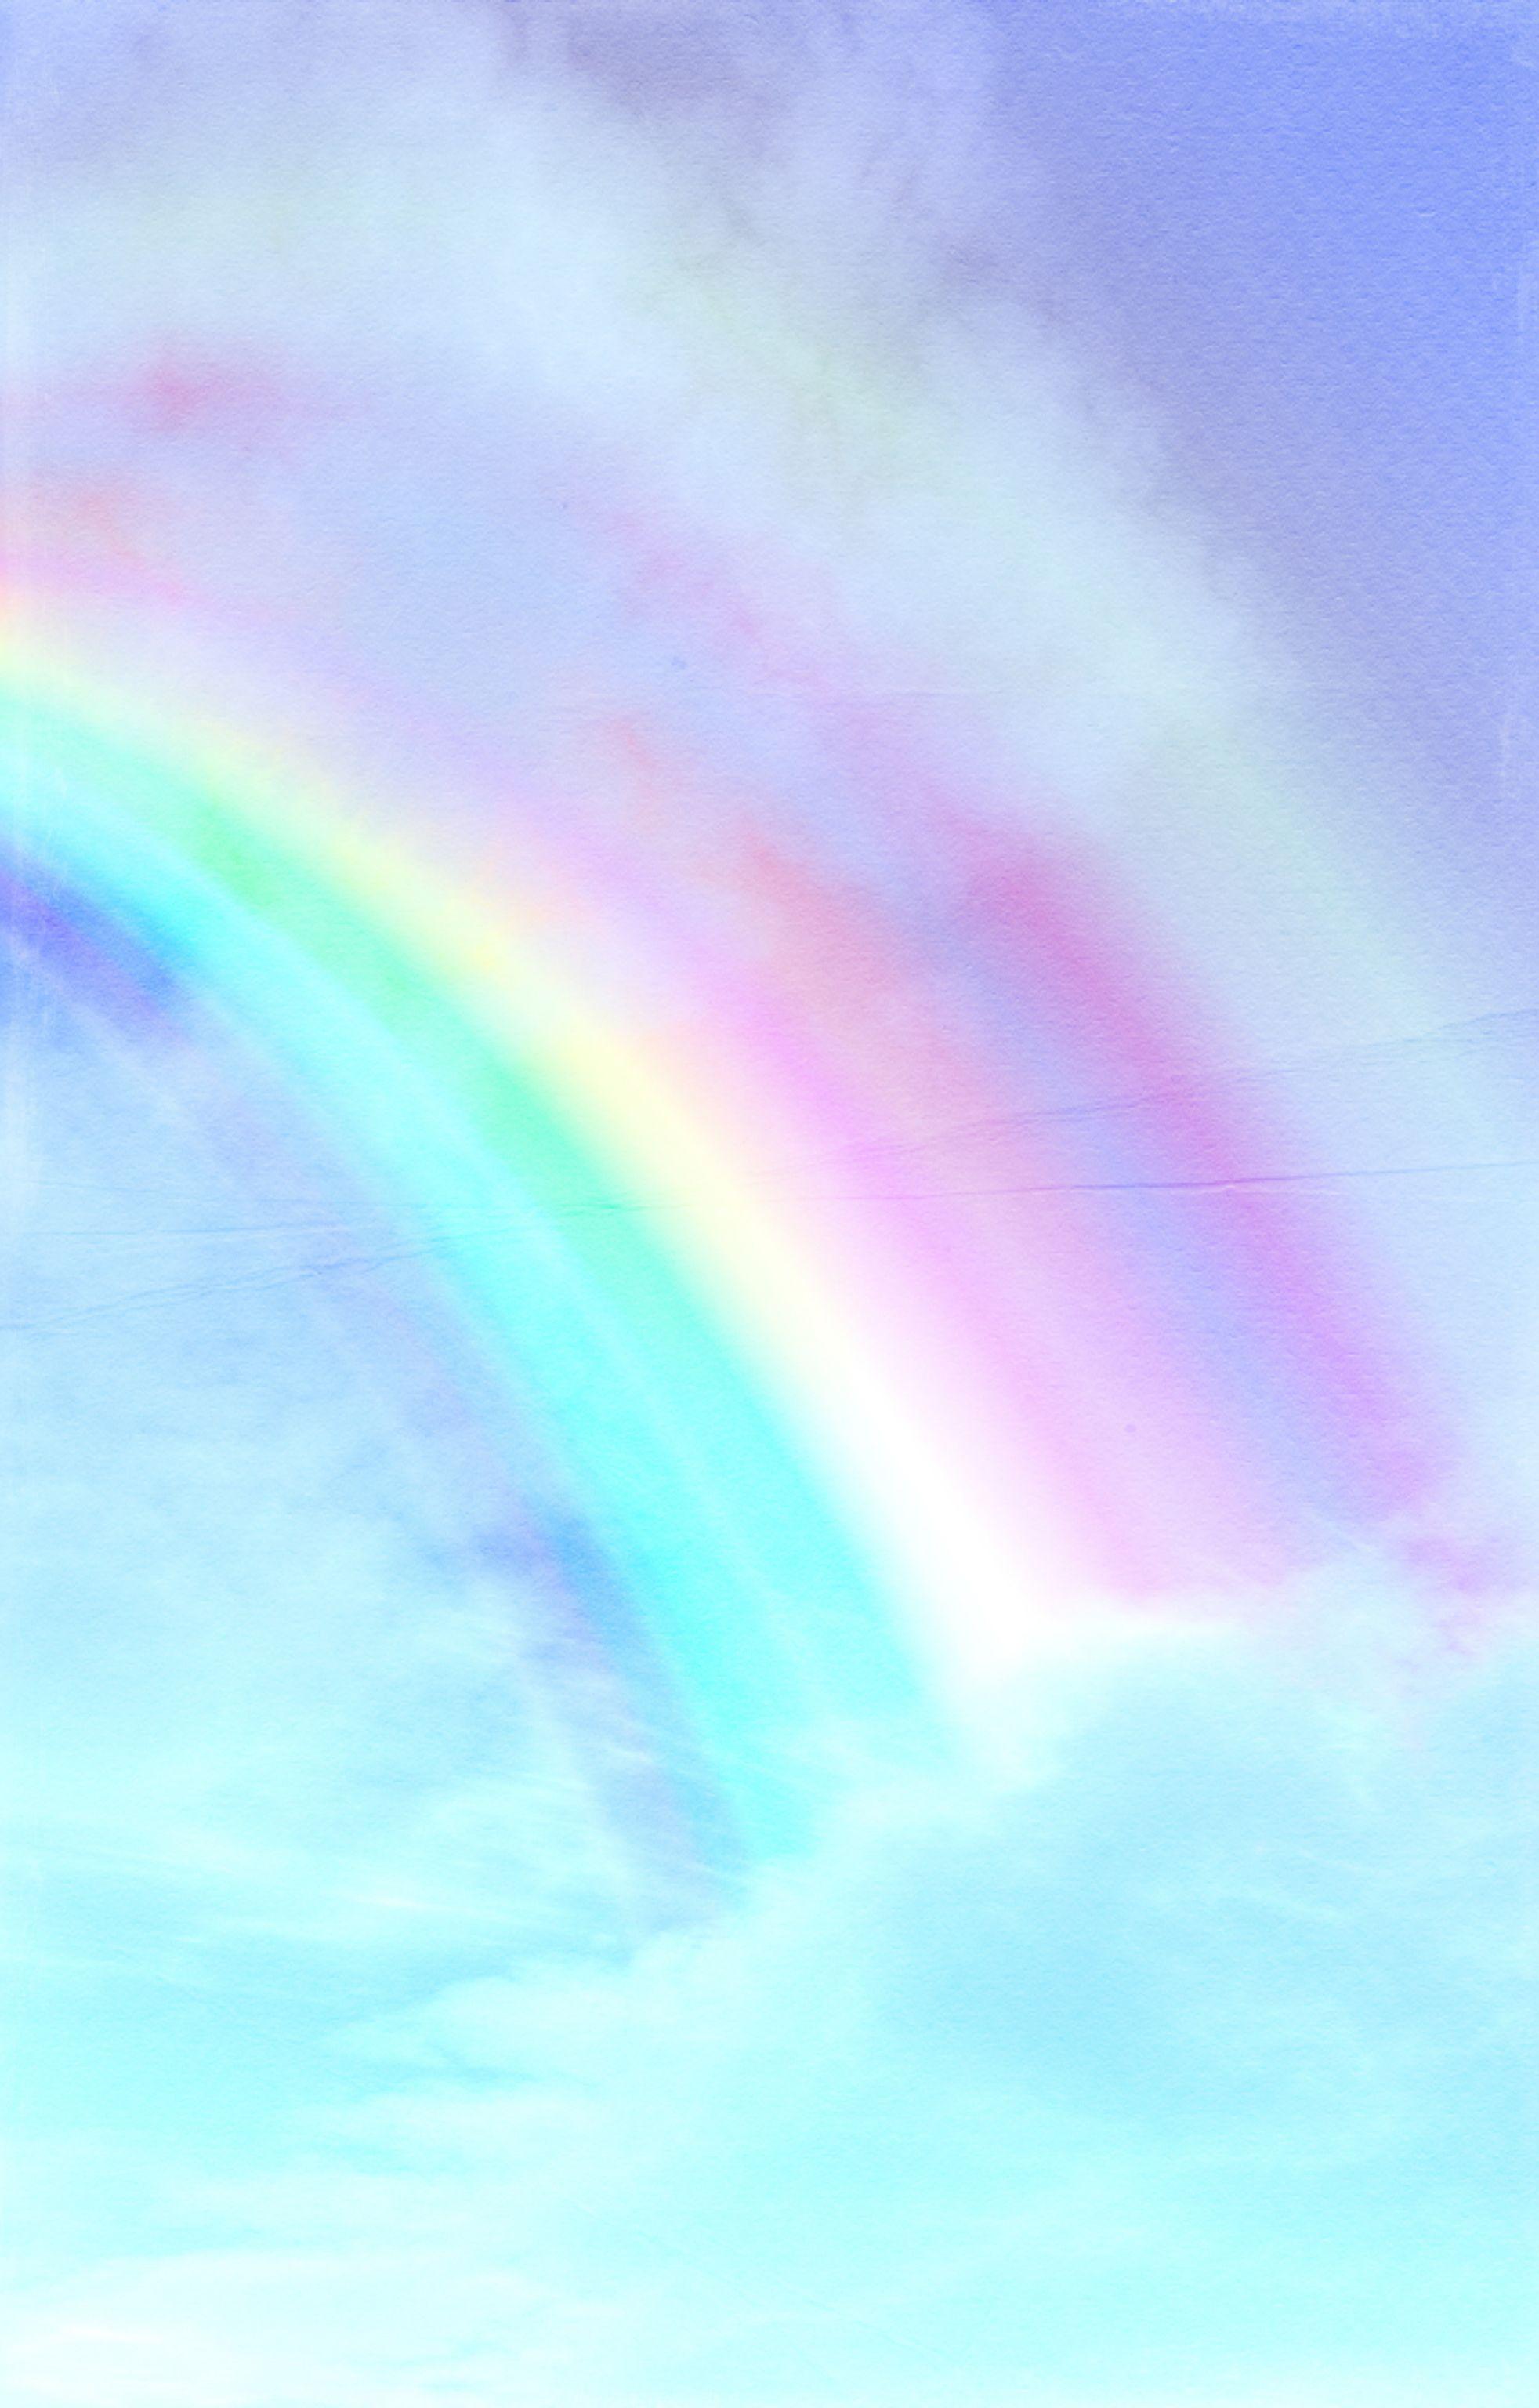 Cute rainbow wallpapers top free cute rainbow - Rainbow background pastel ...